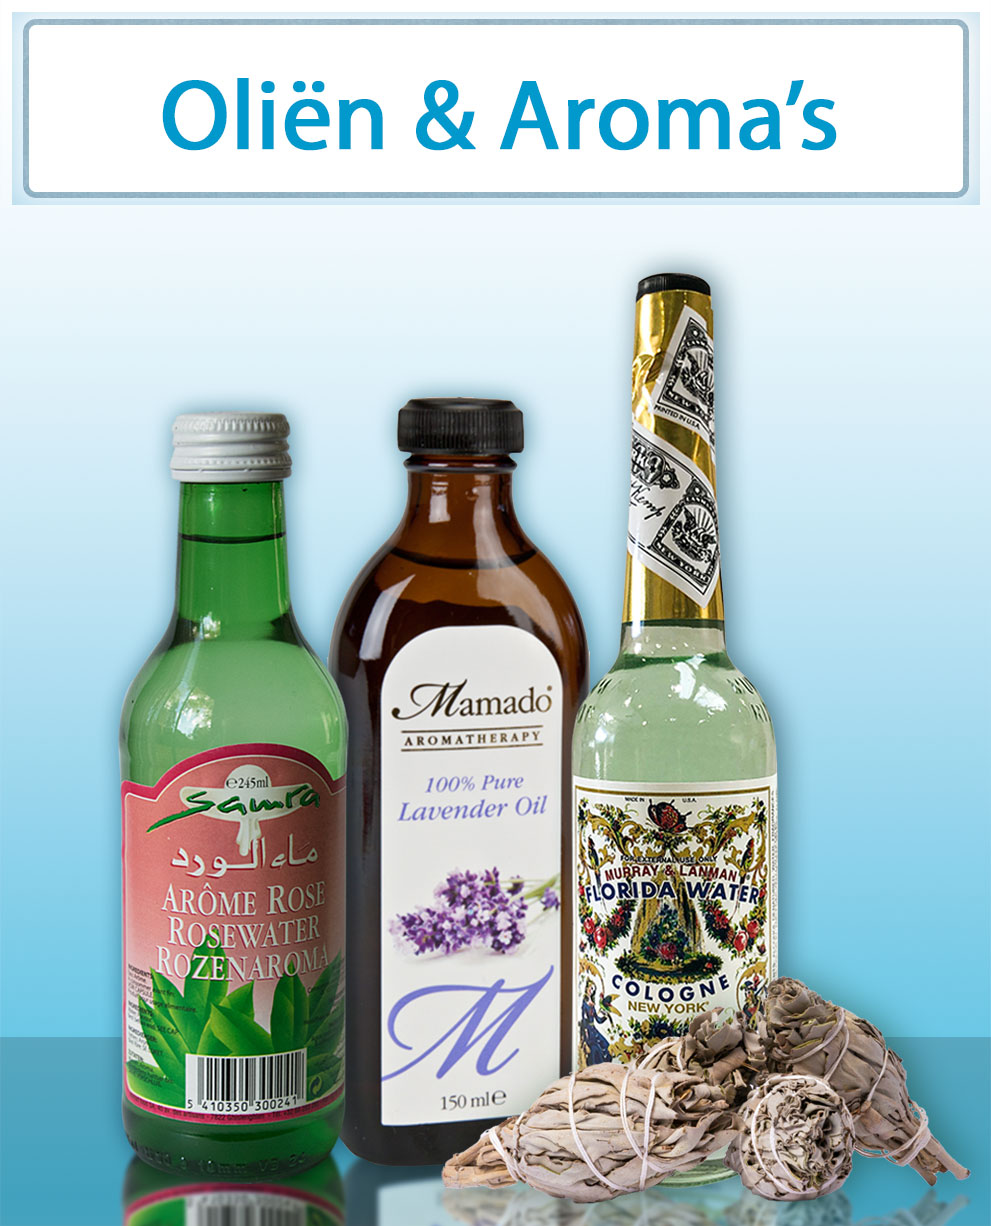 Categorie-04-olien-en-aromas-bakingsoda-nl